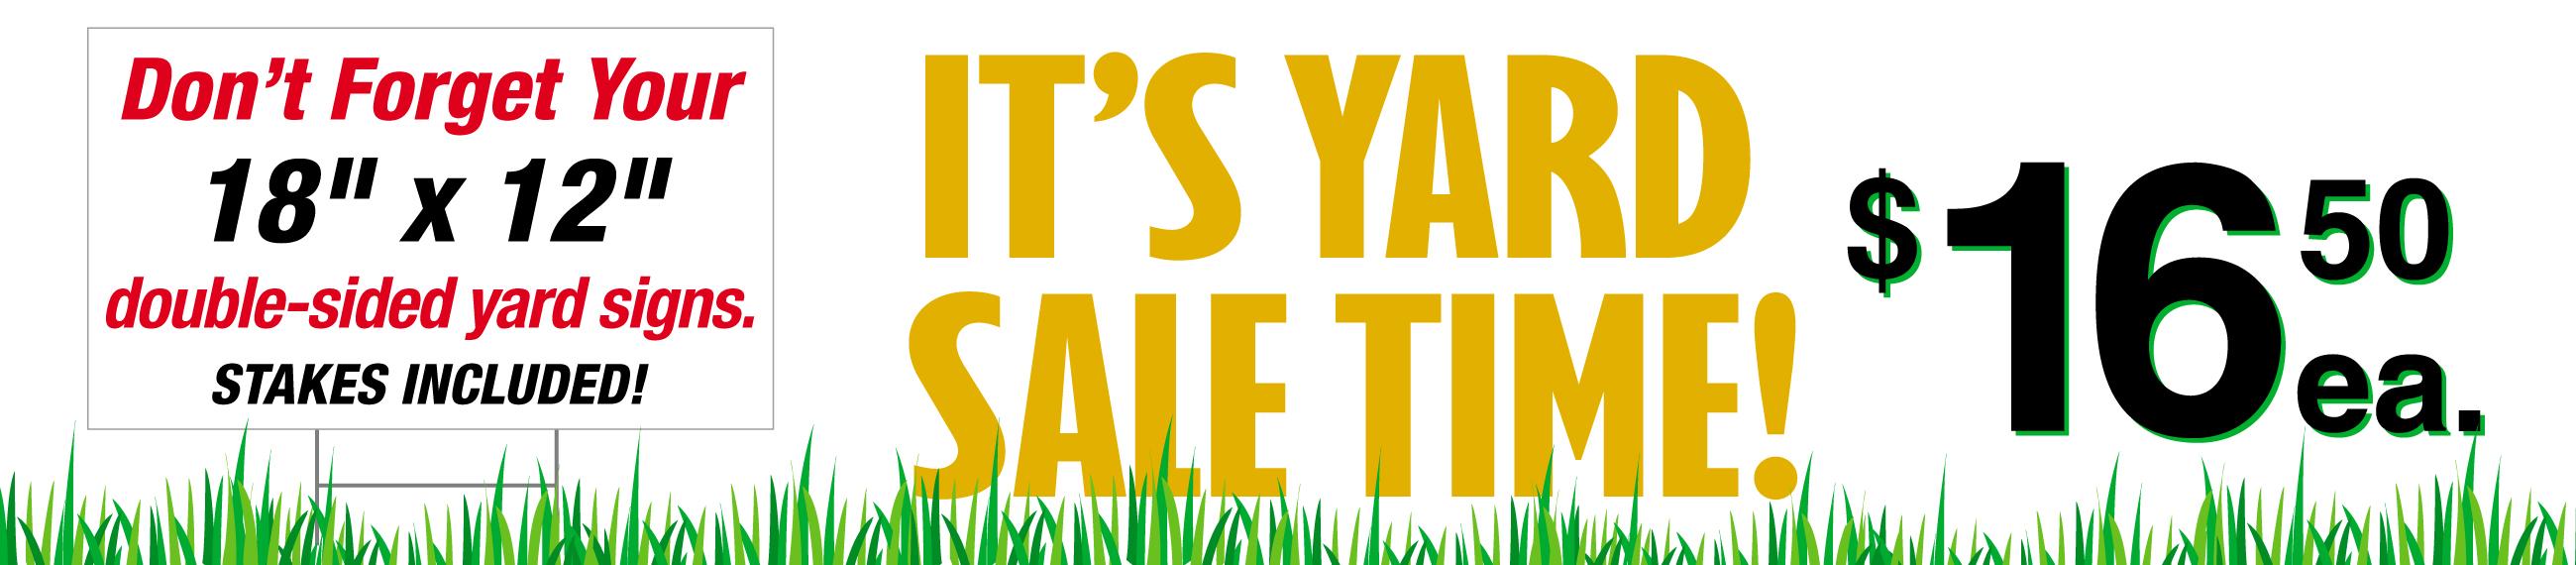 Yard-sale-signs_nvizion-inc